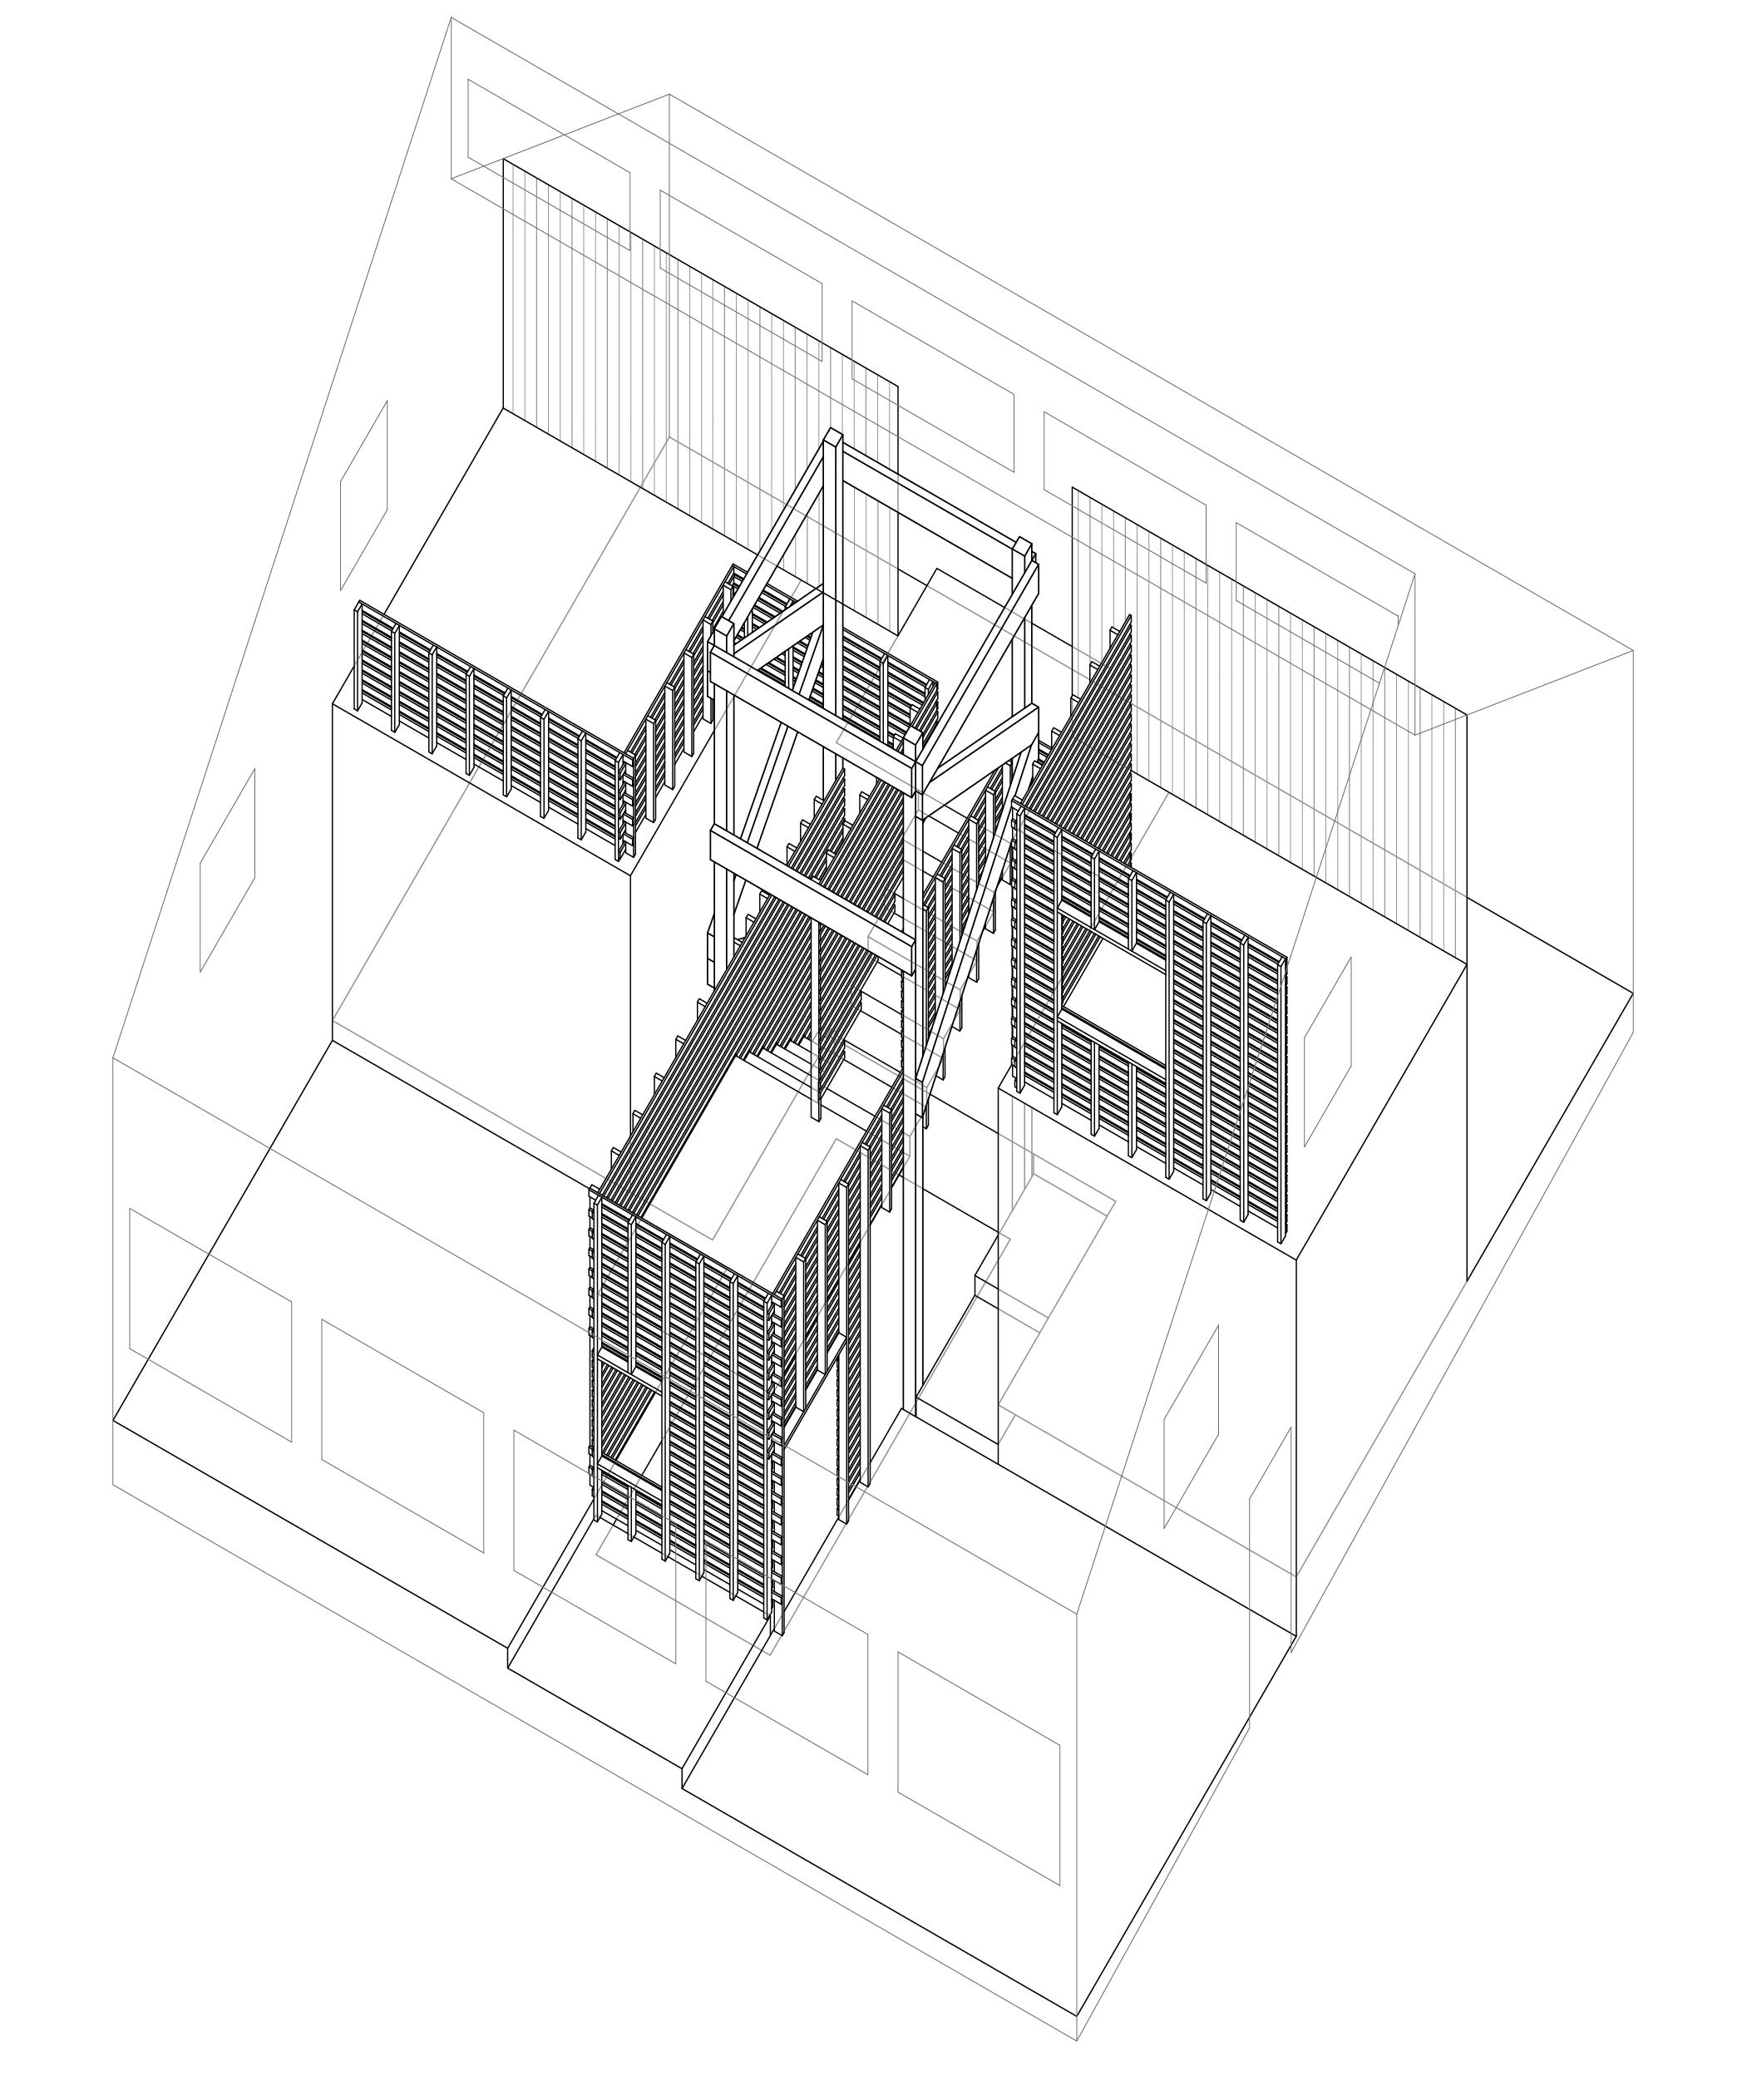 mackinaw house diagram C-01.png